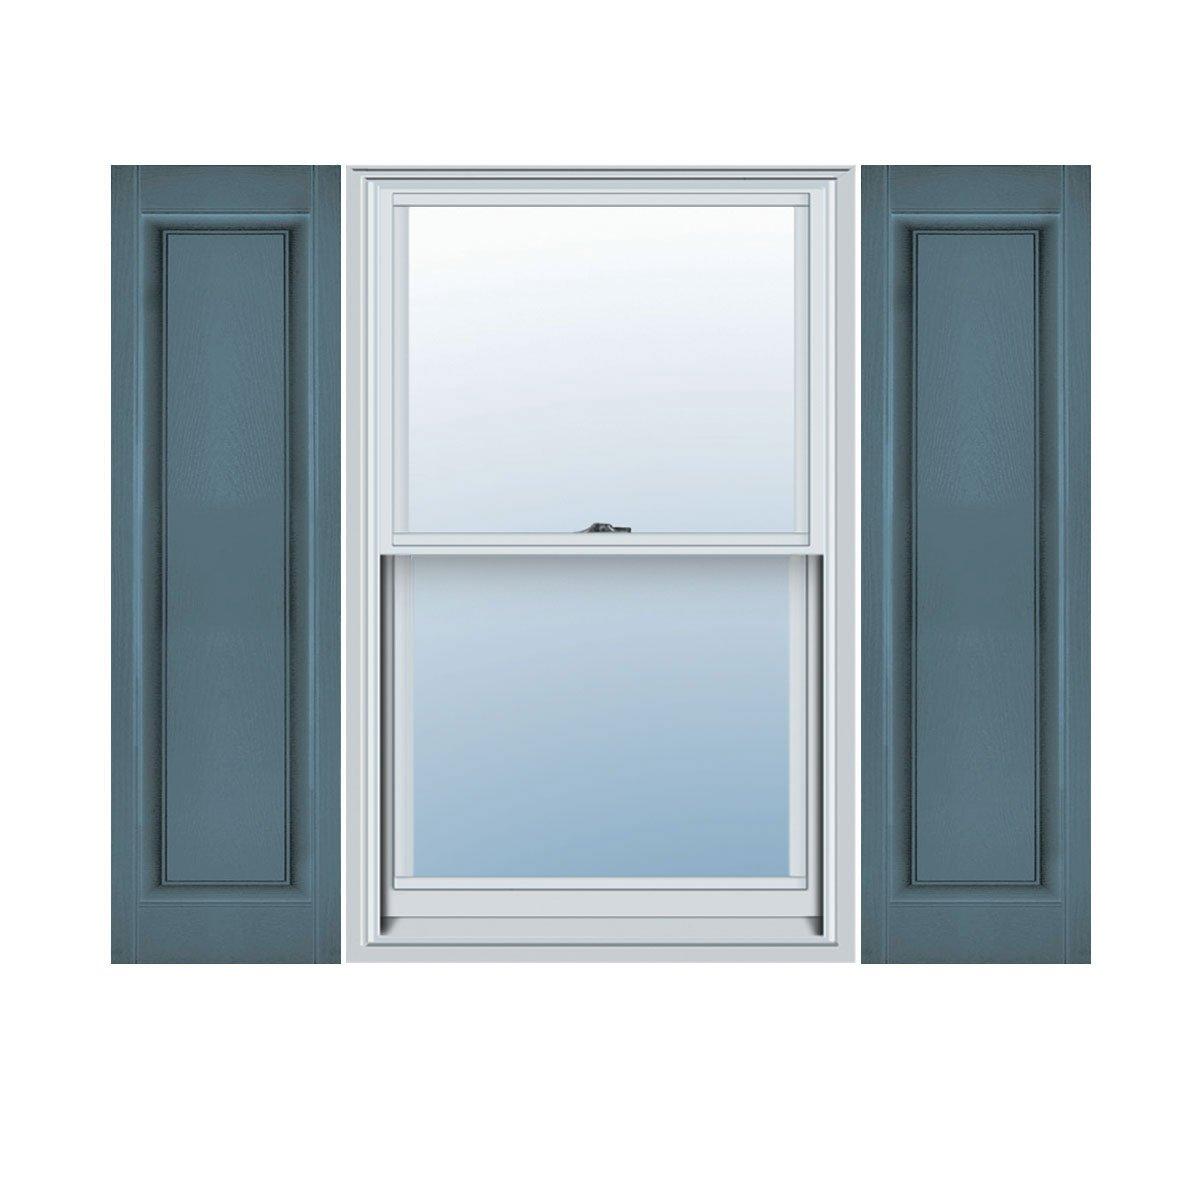 Ekena Millwork LP1C12X03800WB Custom Single Panel, Raised PanelShutter (Per Pair)12''W x 38''HWedgewood Blue by Ekena Millwork